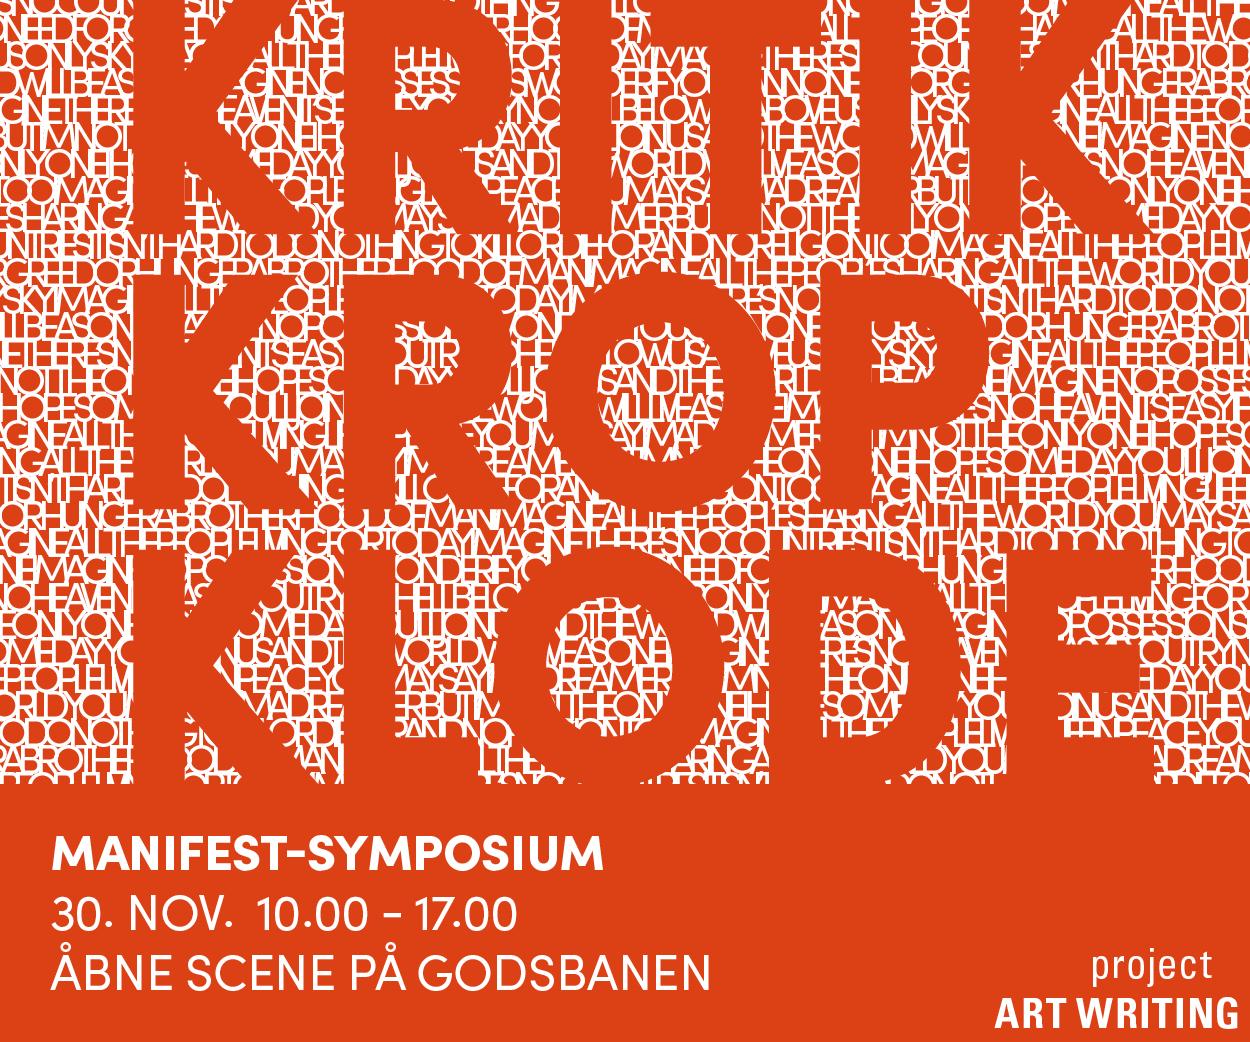 Project Artwriting manifest symposie